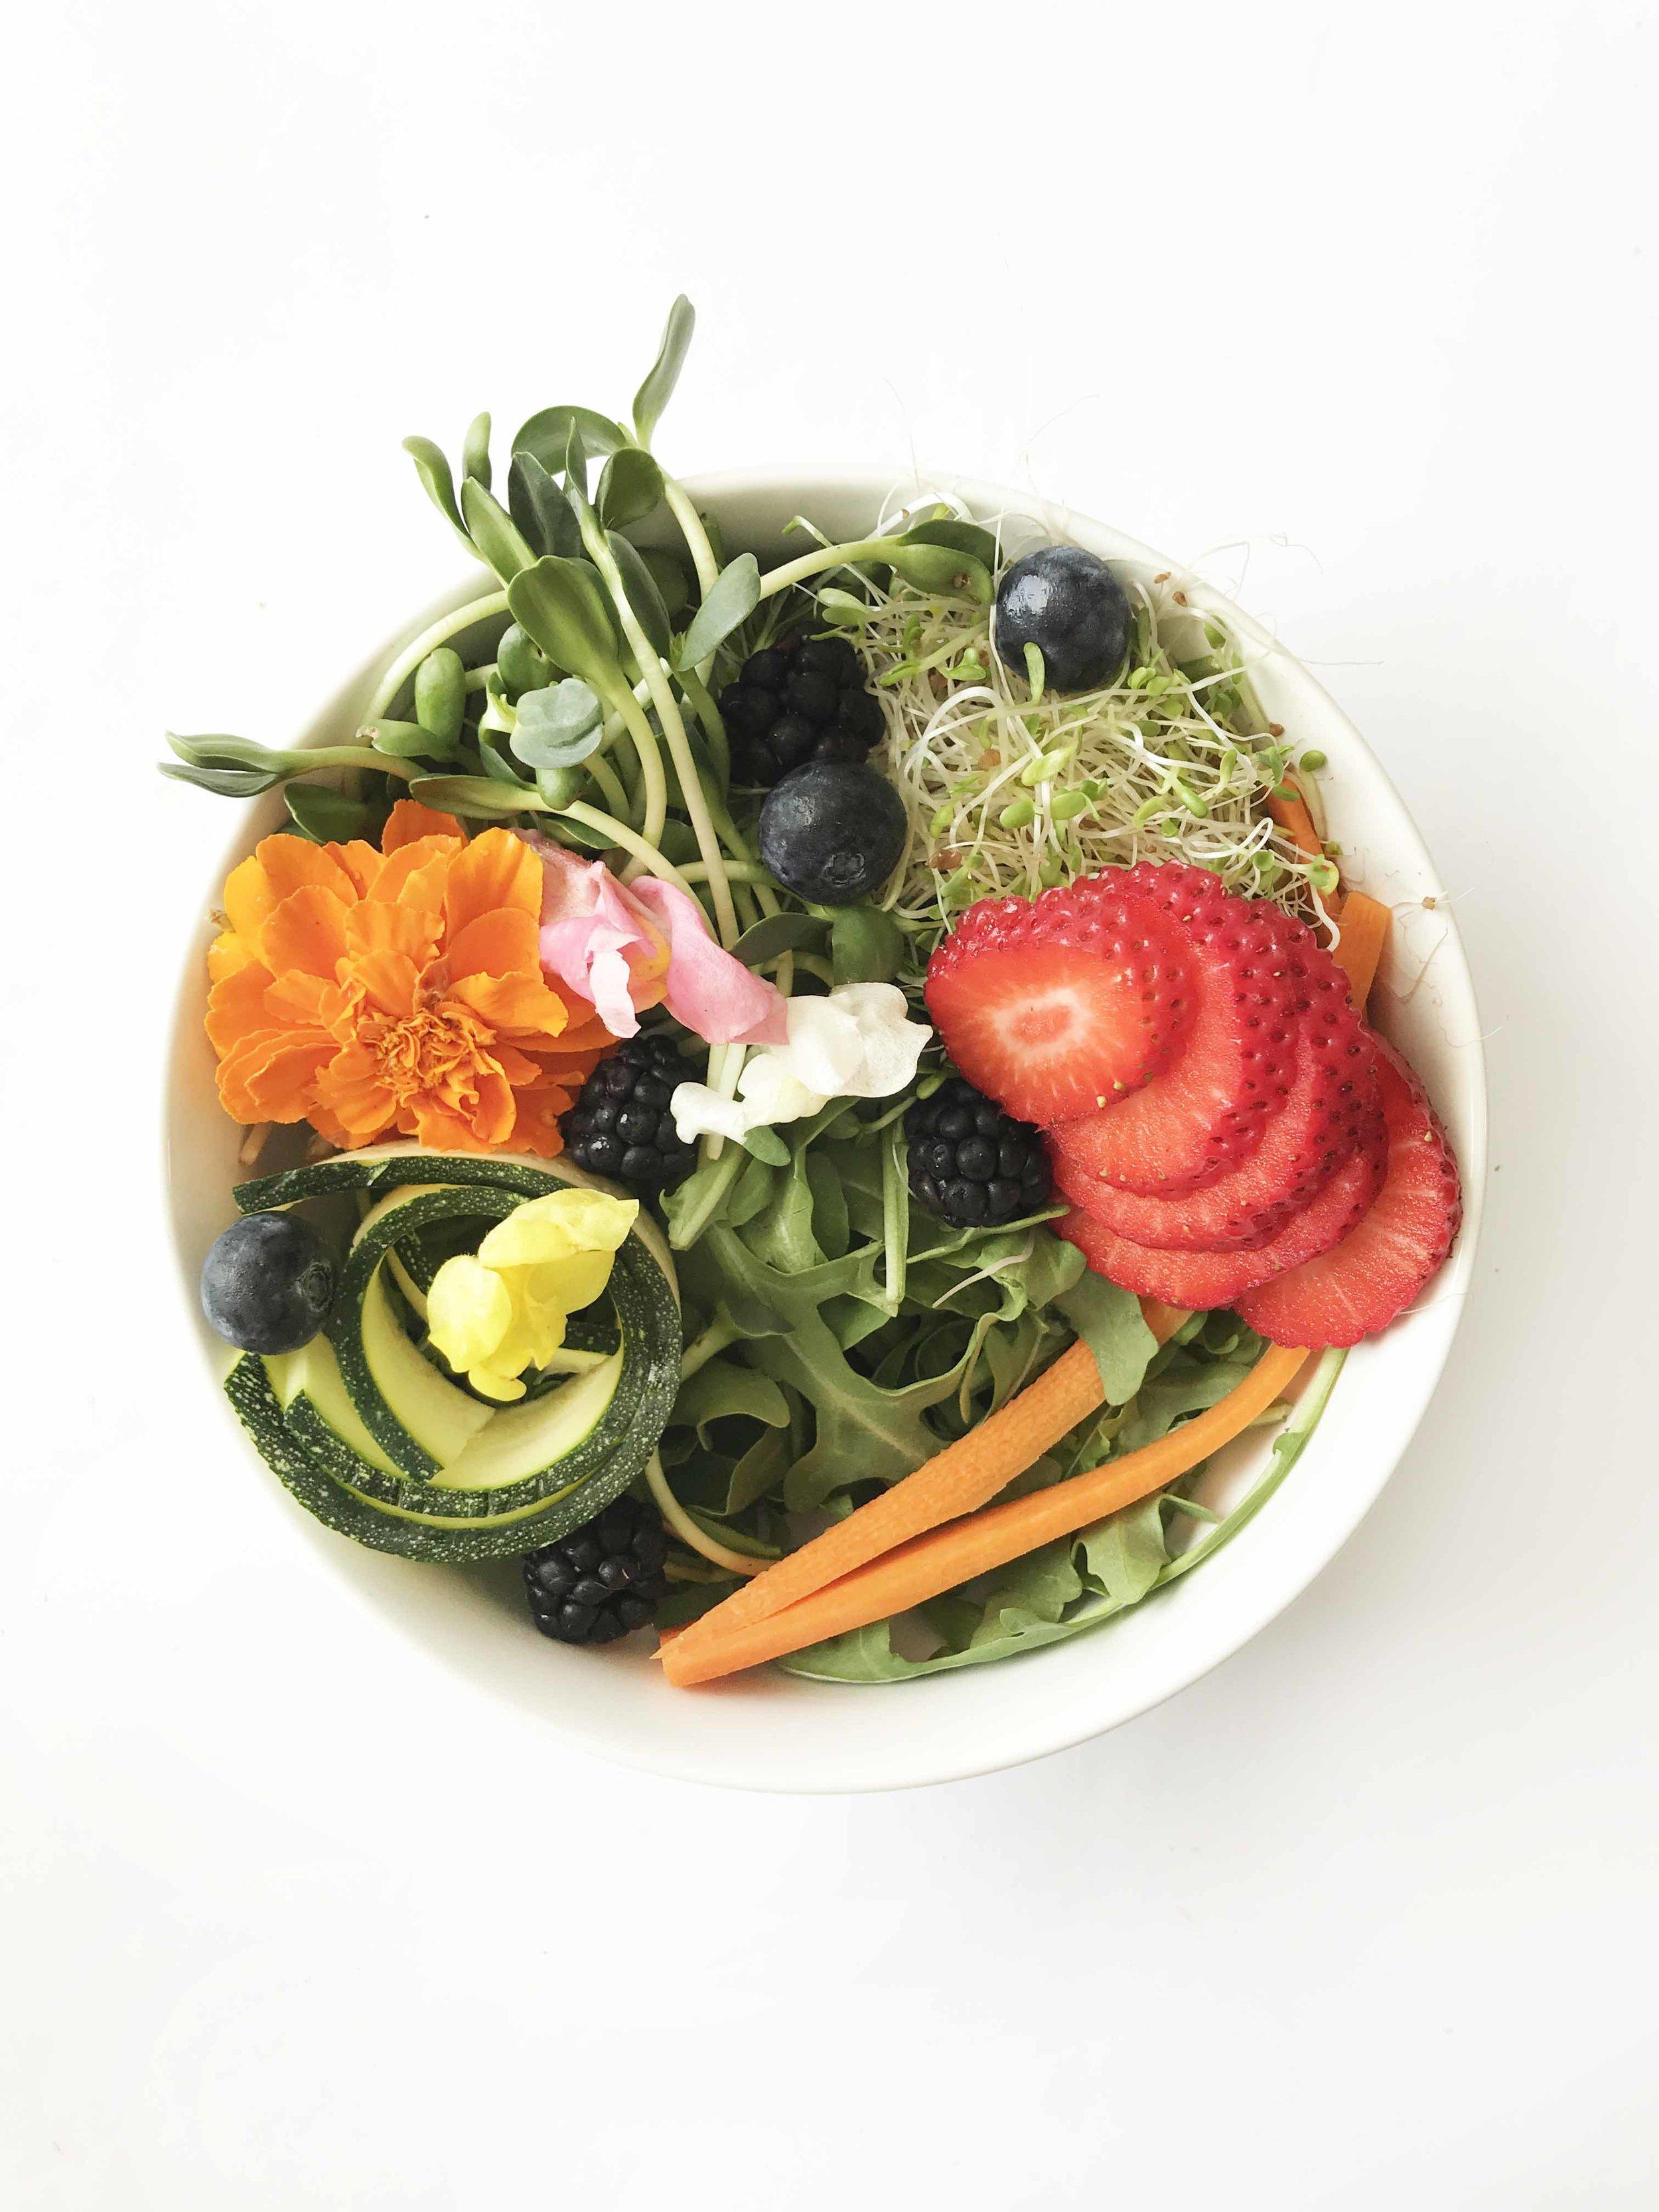 fairy-garden-salad7.jpg